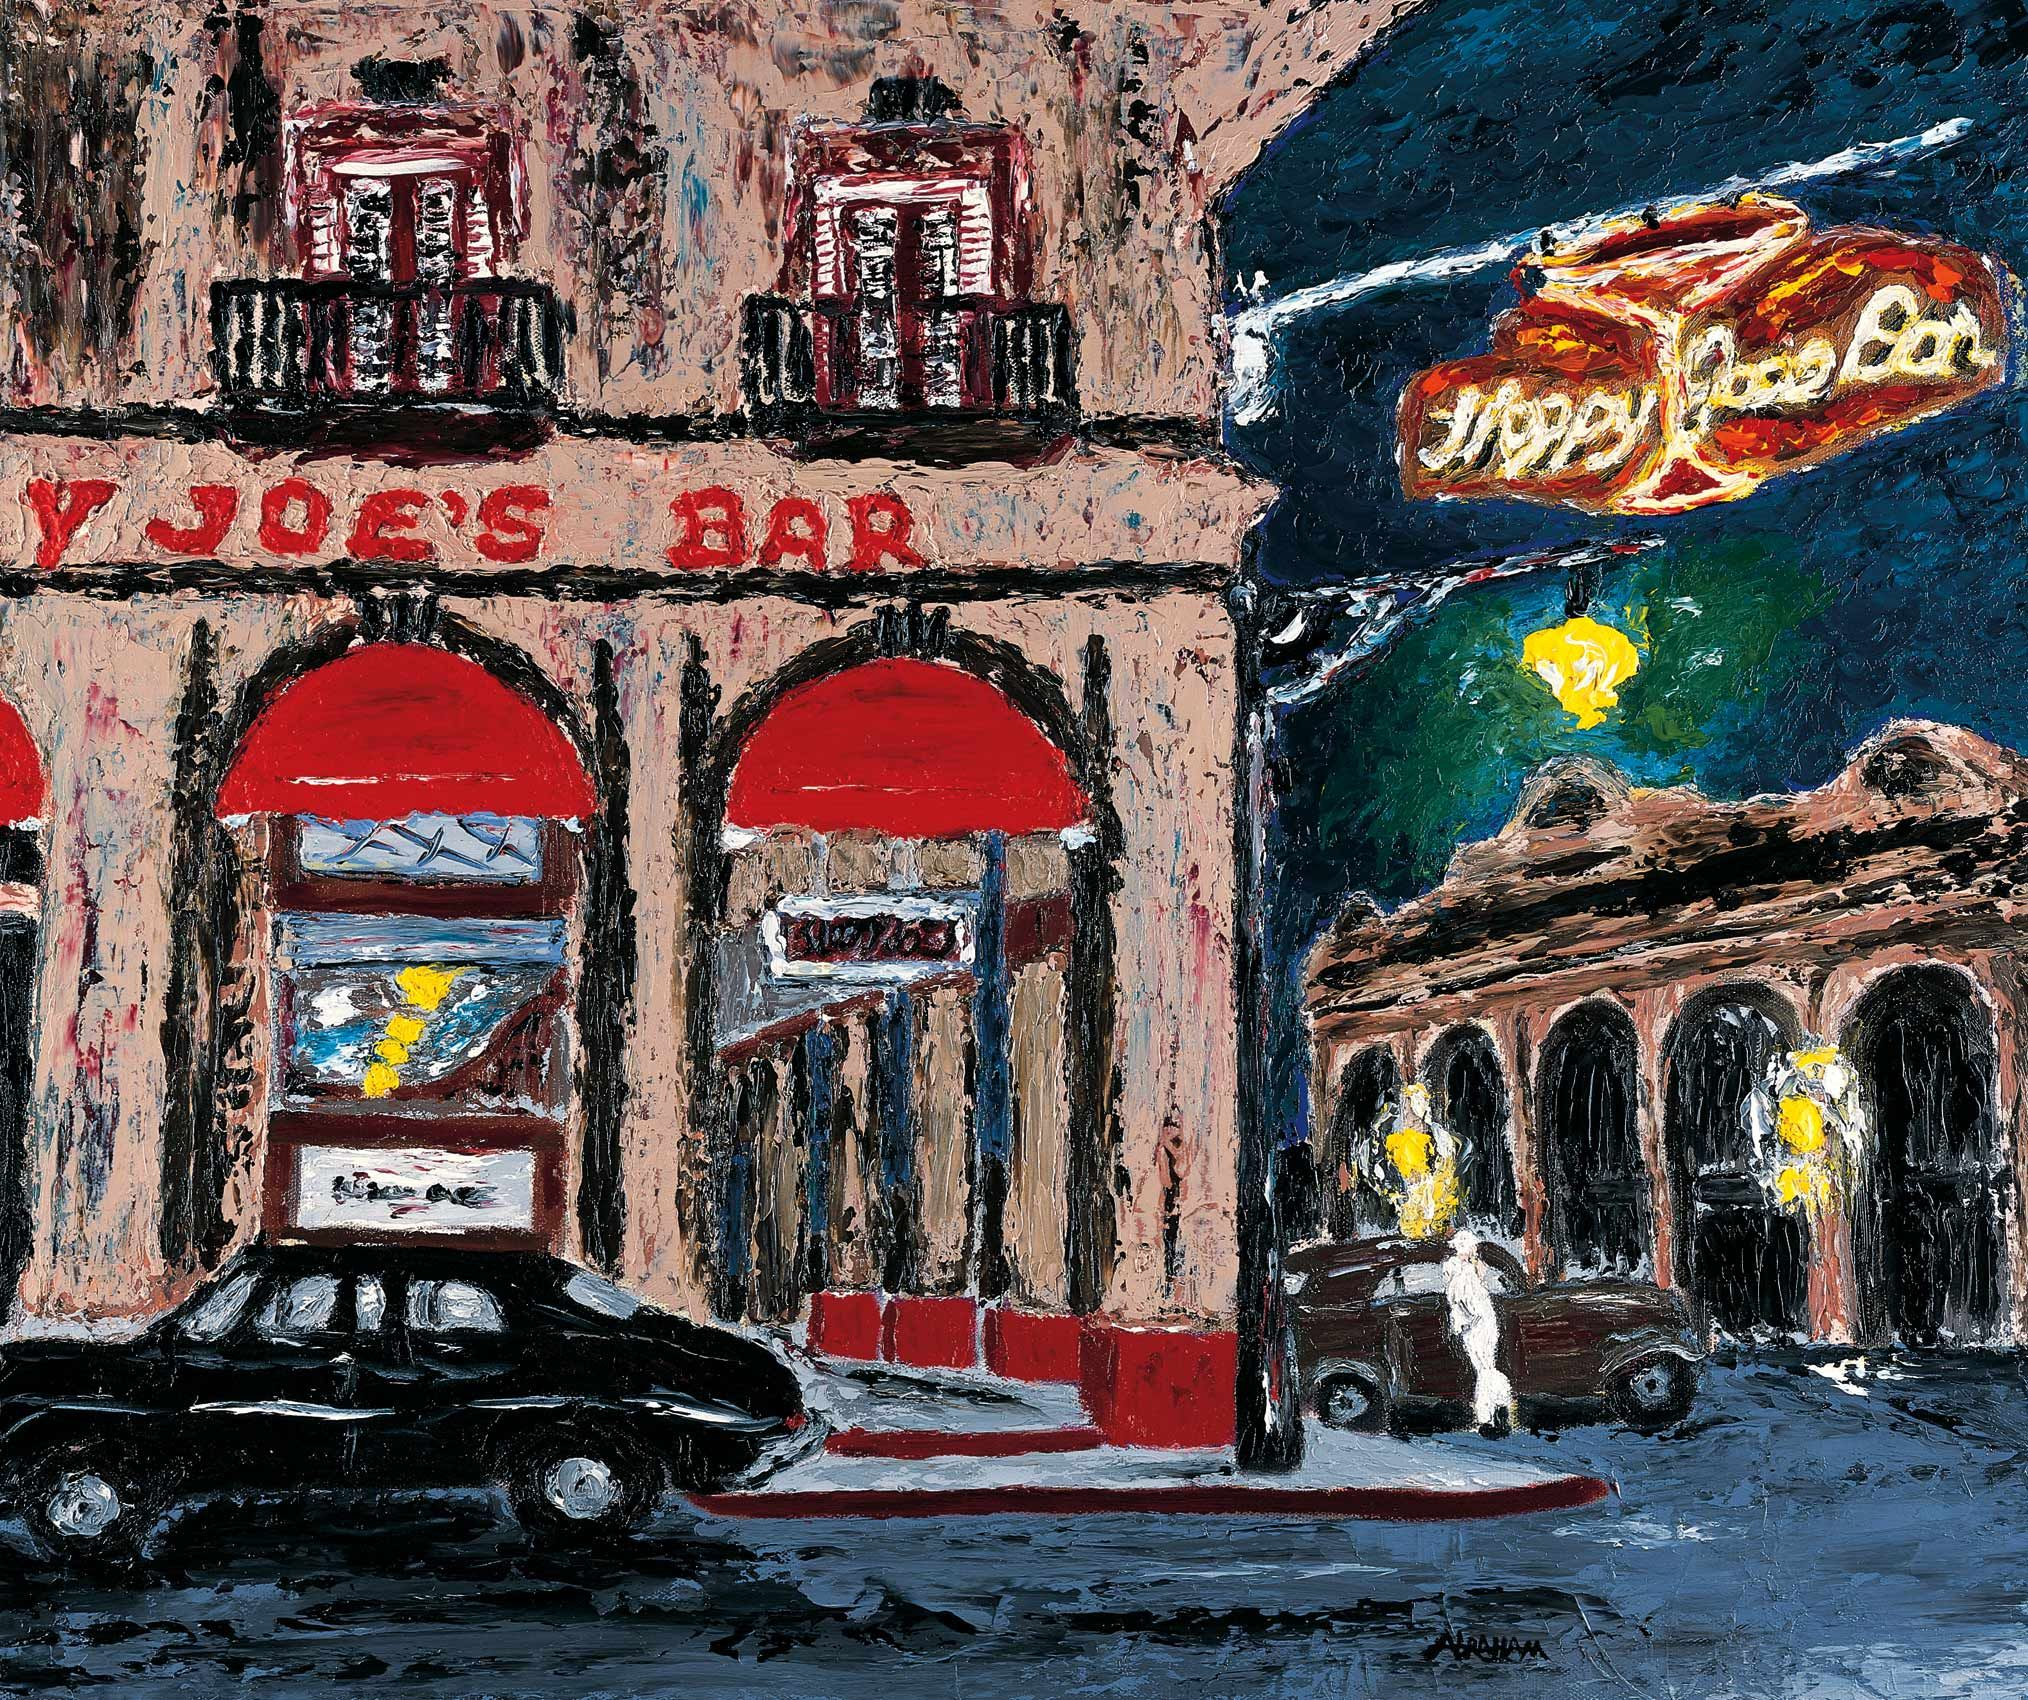 Sloppy Joe's Bar, Havana